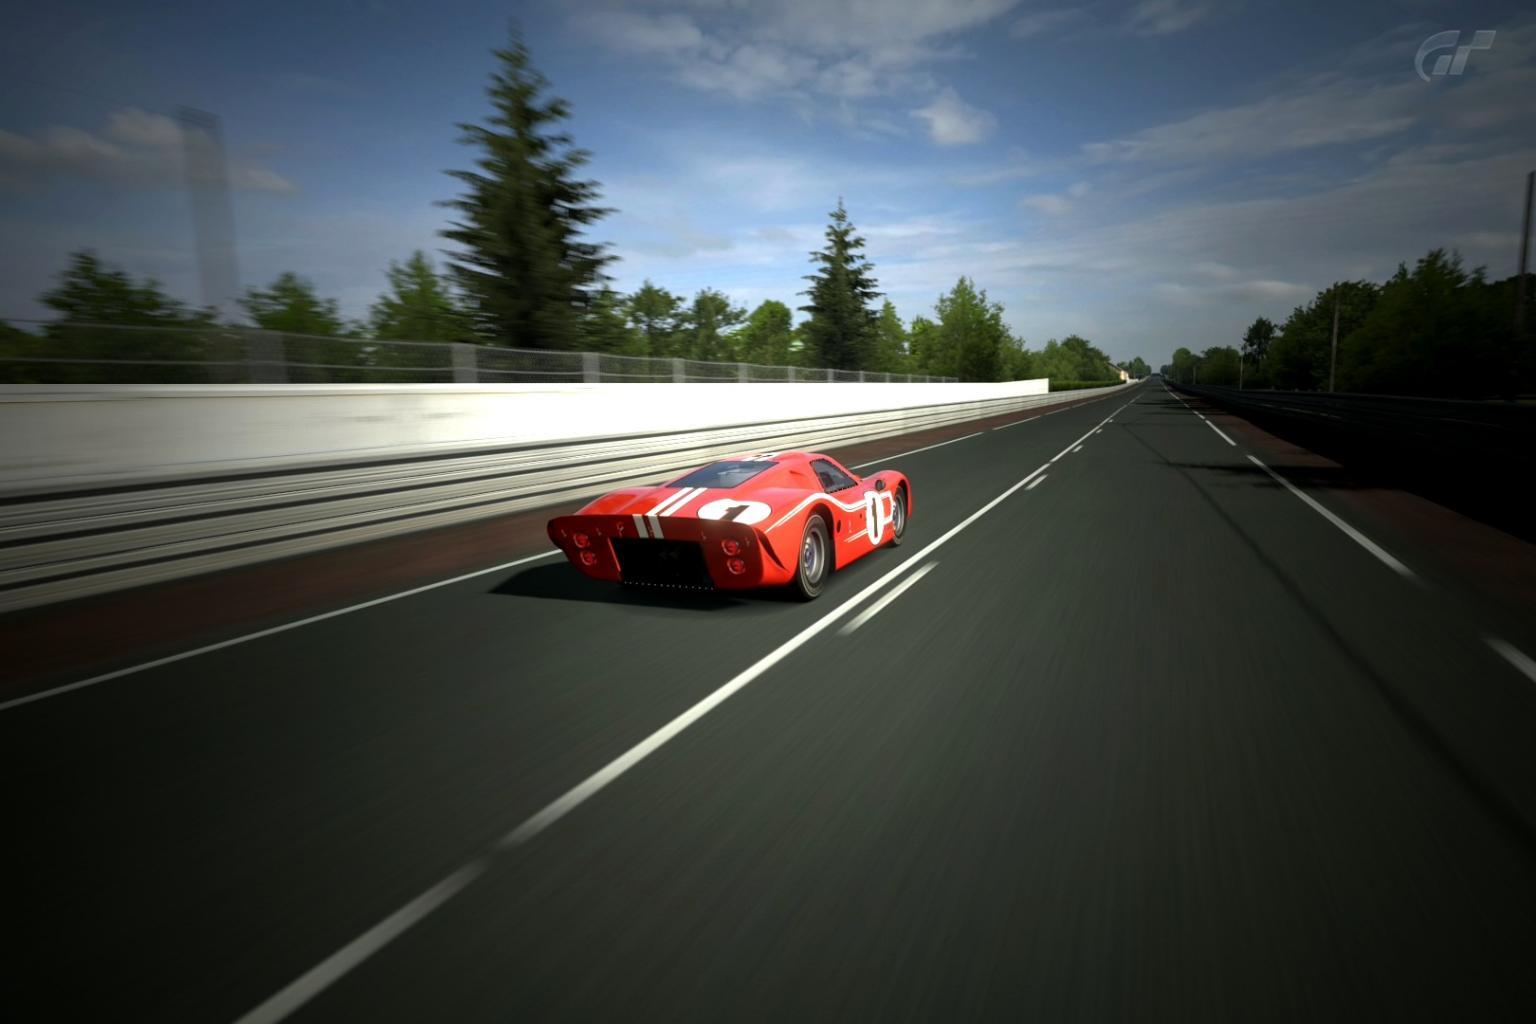 BigB's RCR MKIV-circuit-de-la-sarthe-2005-no-chicanes-_4-jpg